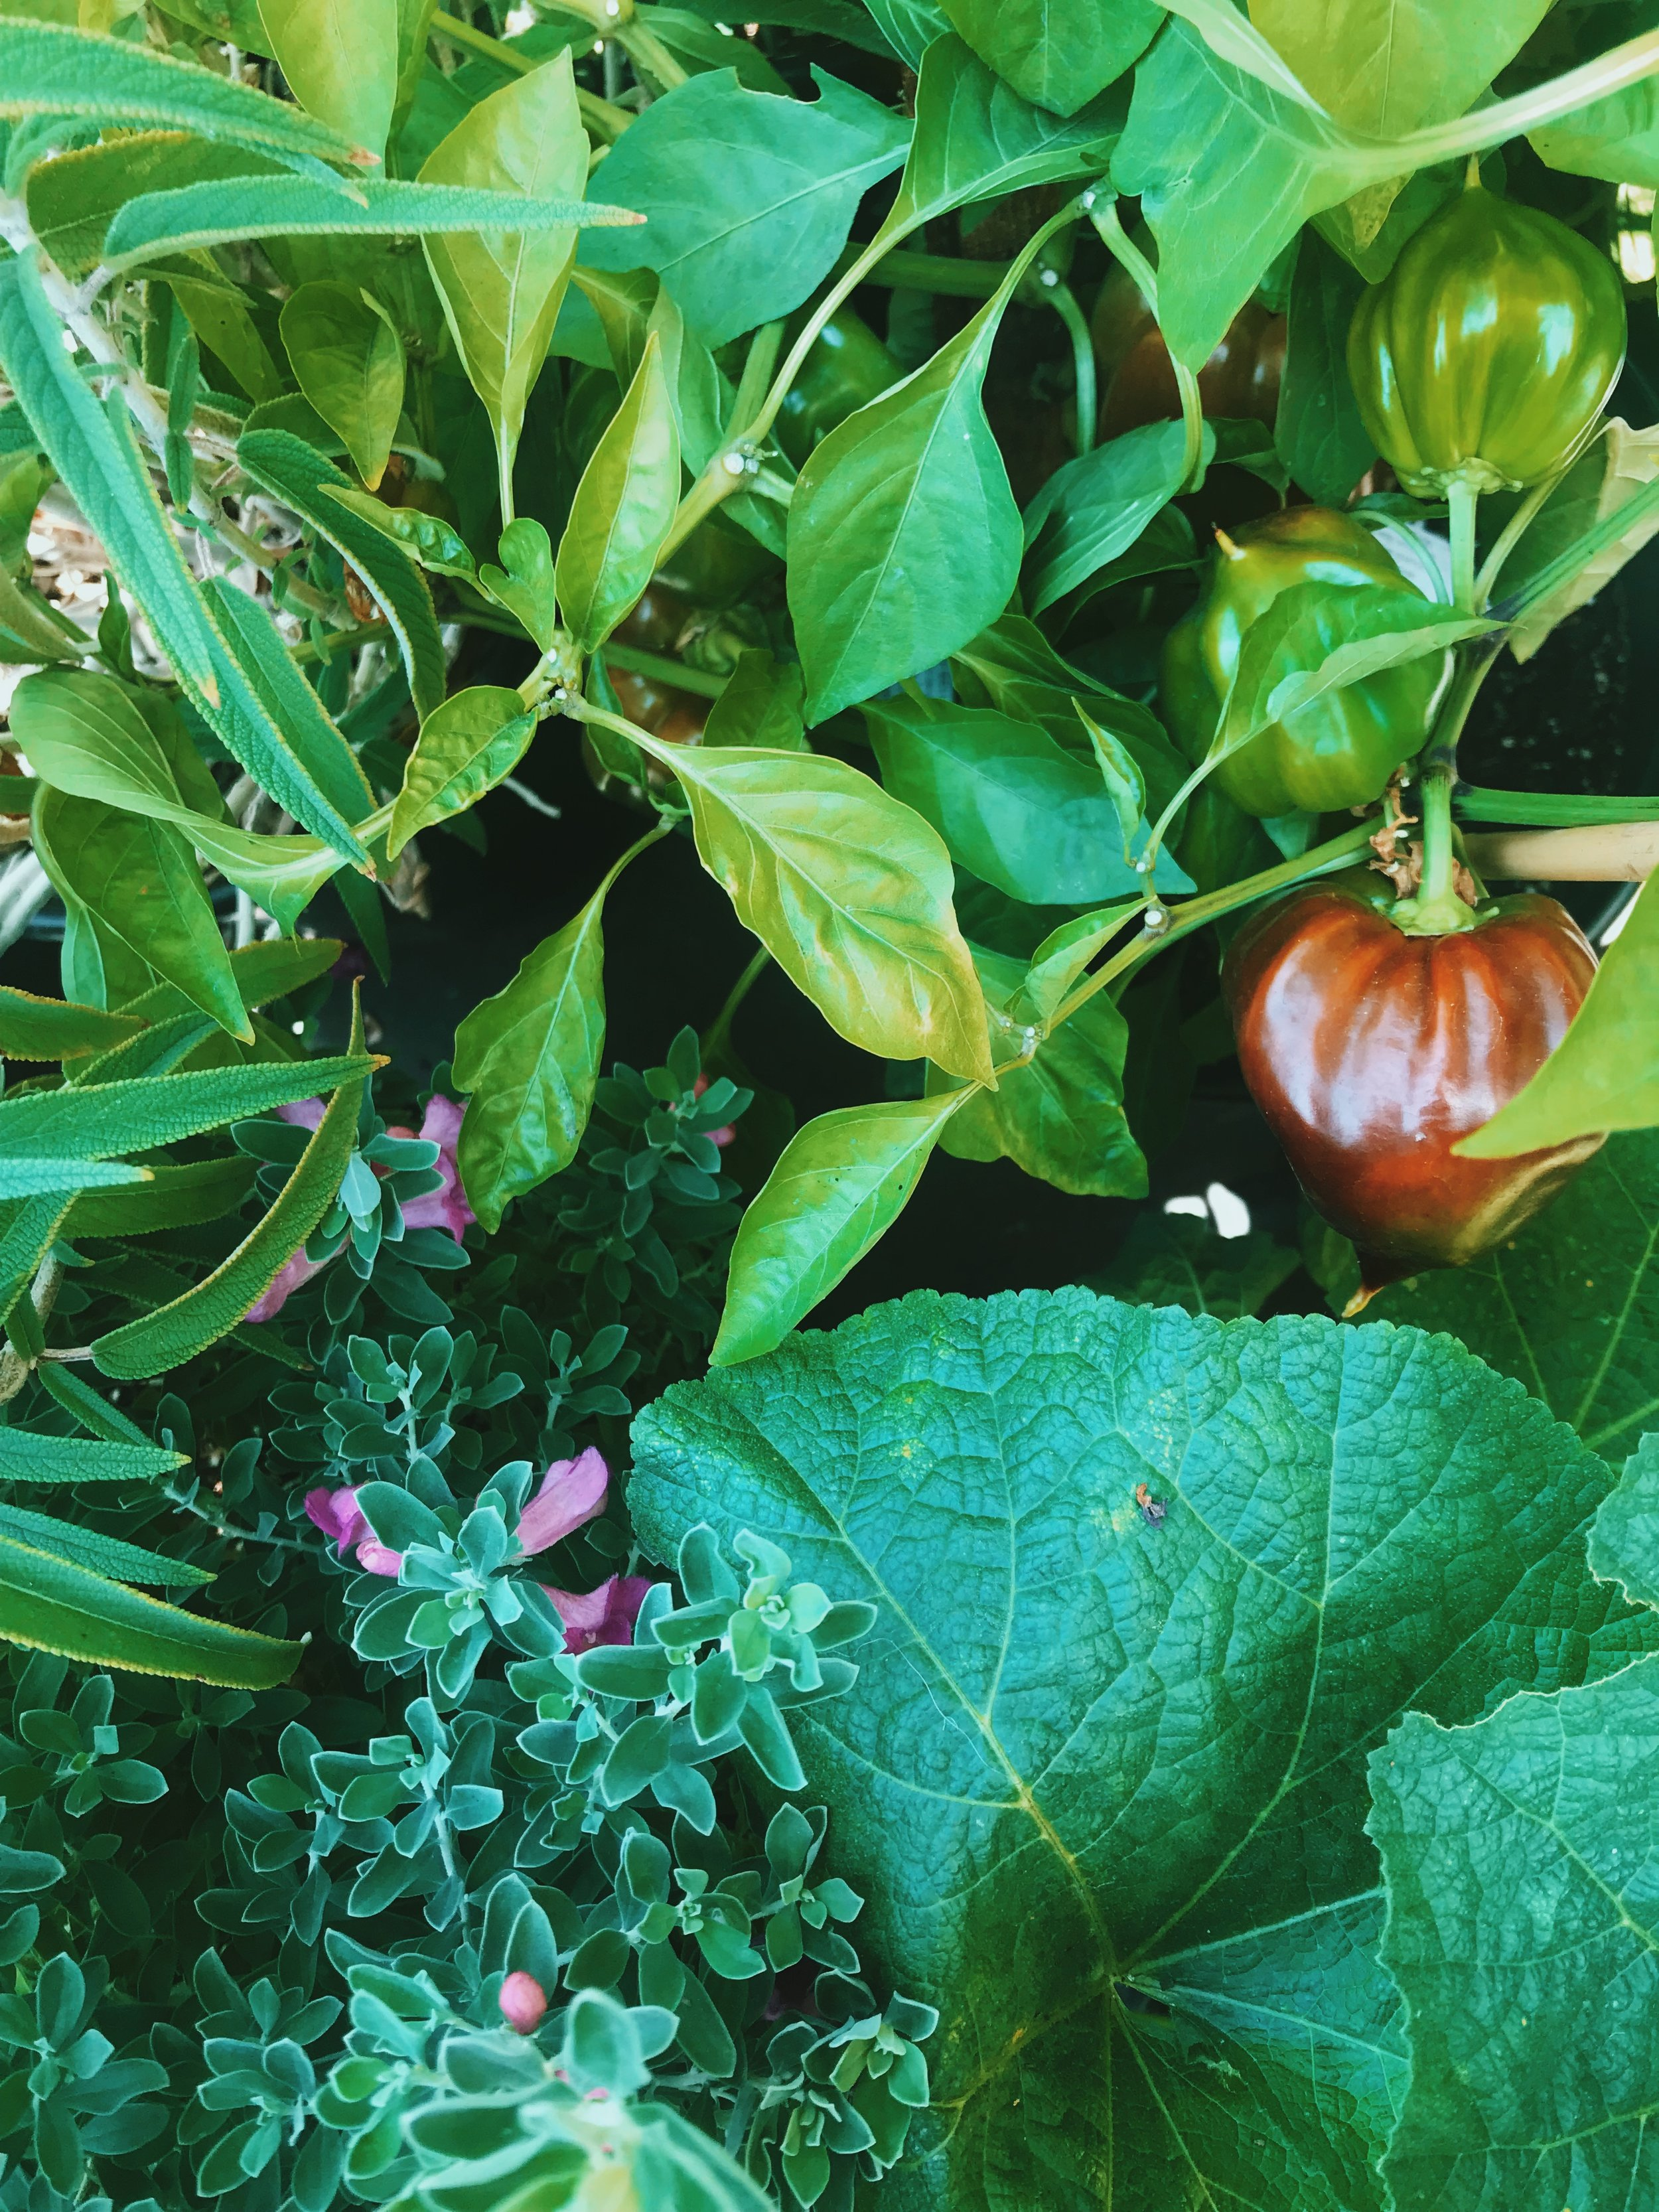 July 5th, 2019: Late Bloomer Varieties - POLLINATORShollyhockstexas ranger sageVEGGIEStoma verde tomatillopersian cucumberchinese green beanwaltham butternut squashzucchini squashvates collardsmomotoro gold, bleeding heart, indigo apple tomatoesfelicity jalepeno, holy mole, big jim, violet sparkle peppersjapanese eggplantMEDICINAL HERBSoriental mugworthuichol tobaccopurple hyacinth beanlemon balmHERBScatnipitalian large leaf basillemongrassmorrocan mintgreek oreganoitalian parsleytarragonlemon gold + pizza thymetoothache plant